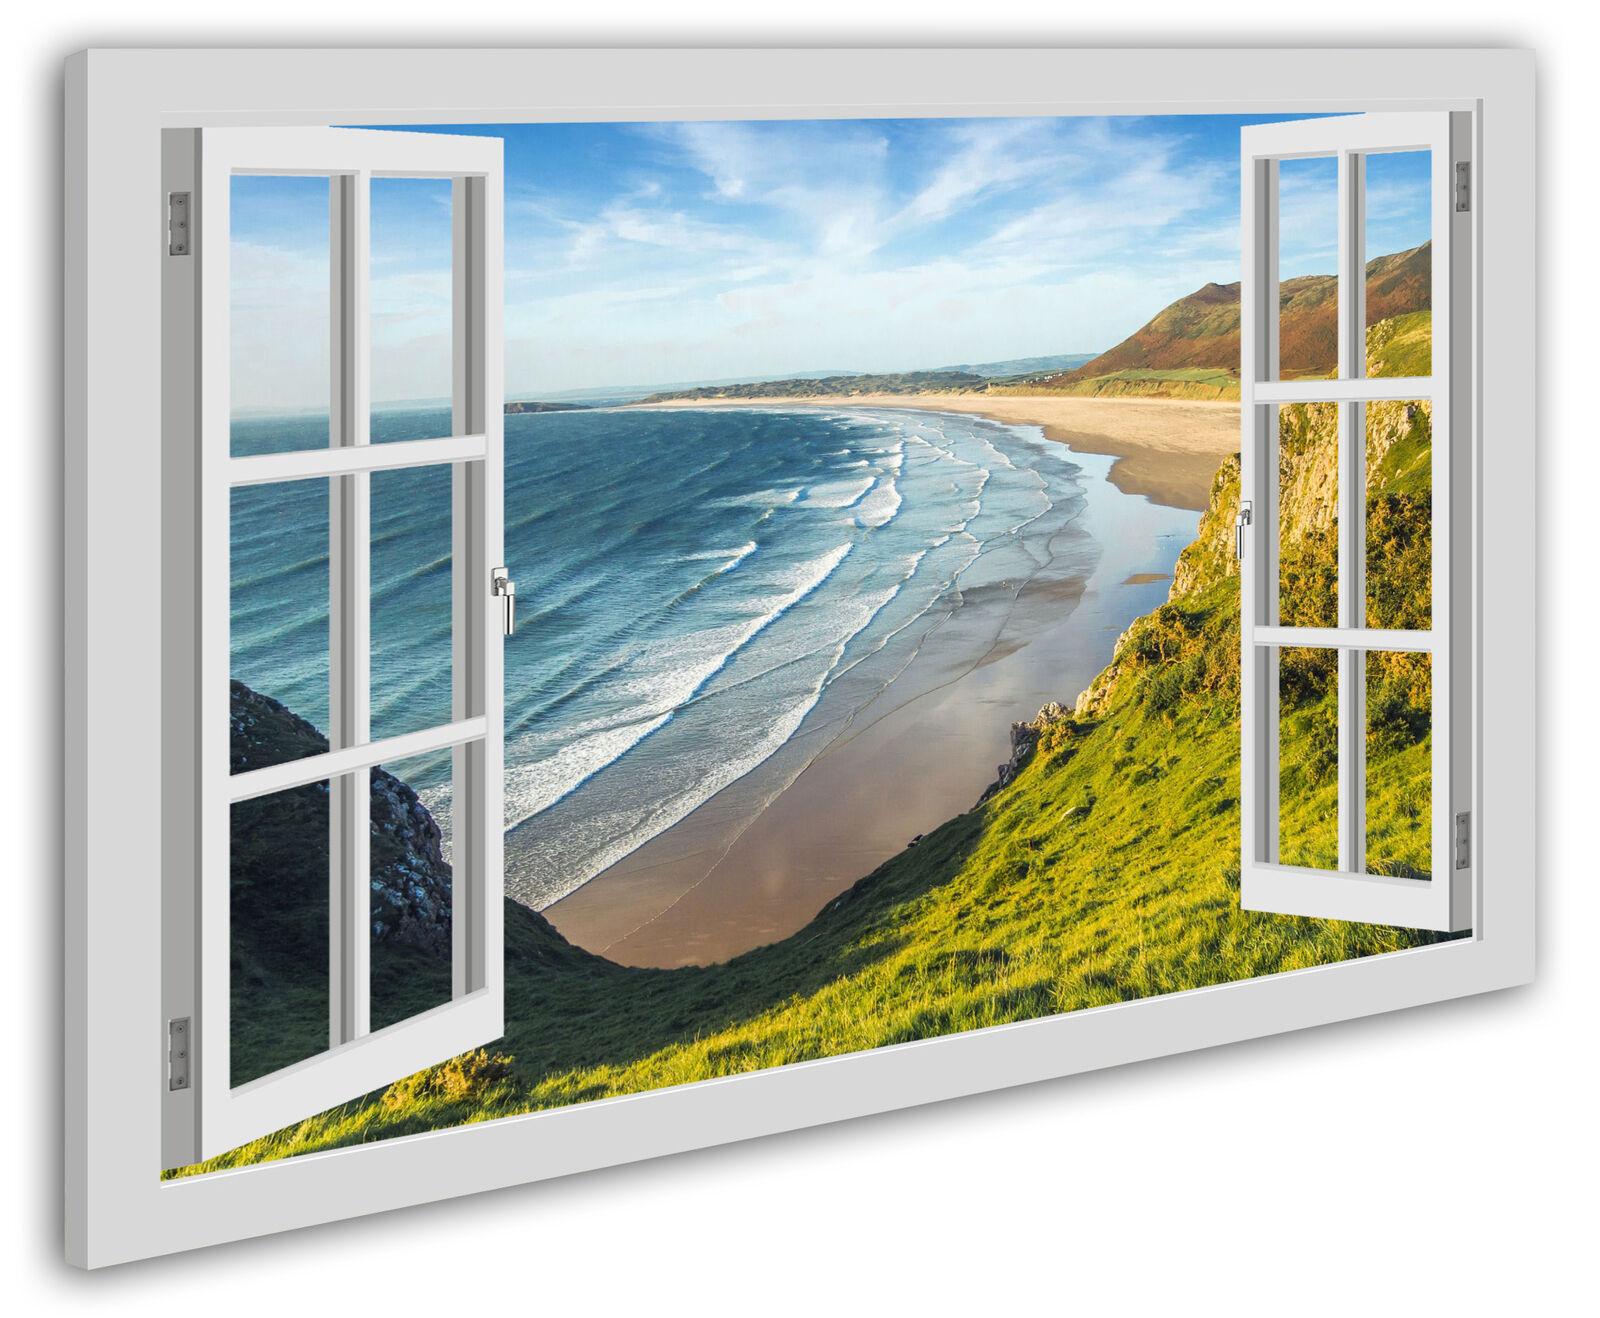 Leinwandbild Wandbild Fensterblick Strand Küste Meer England